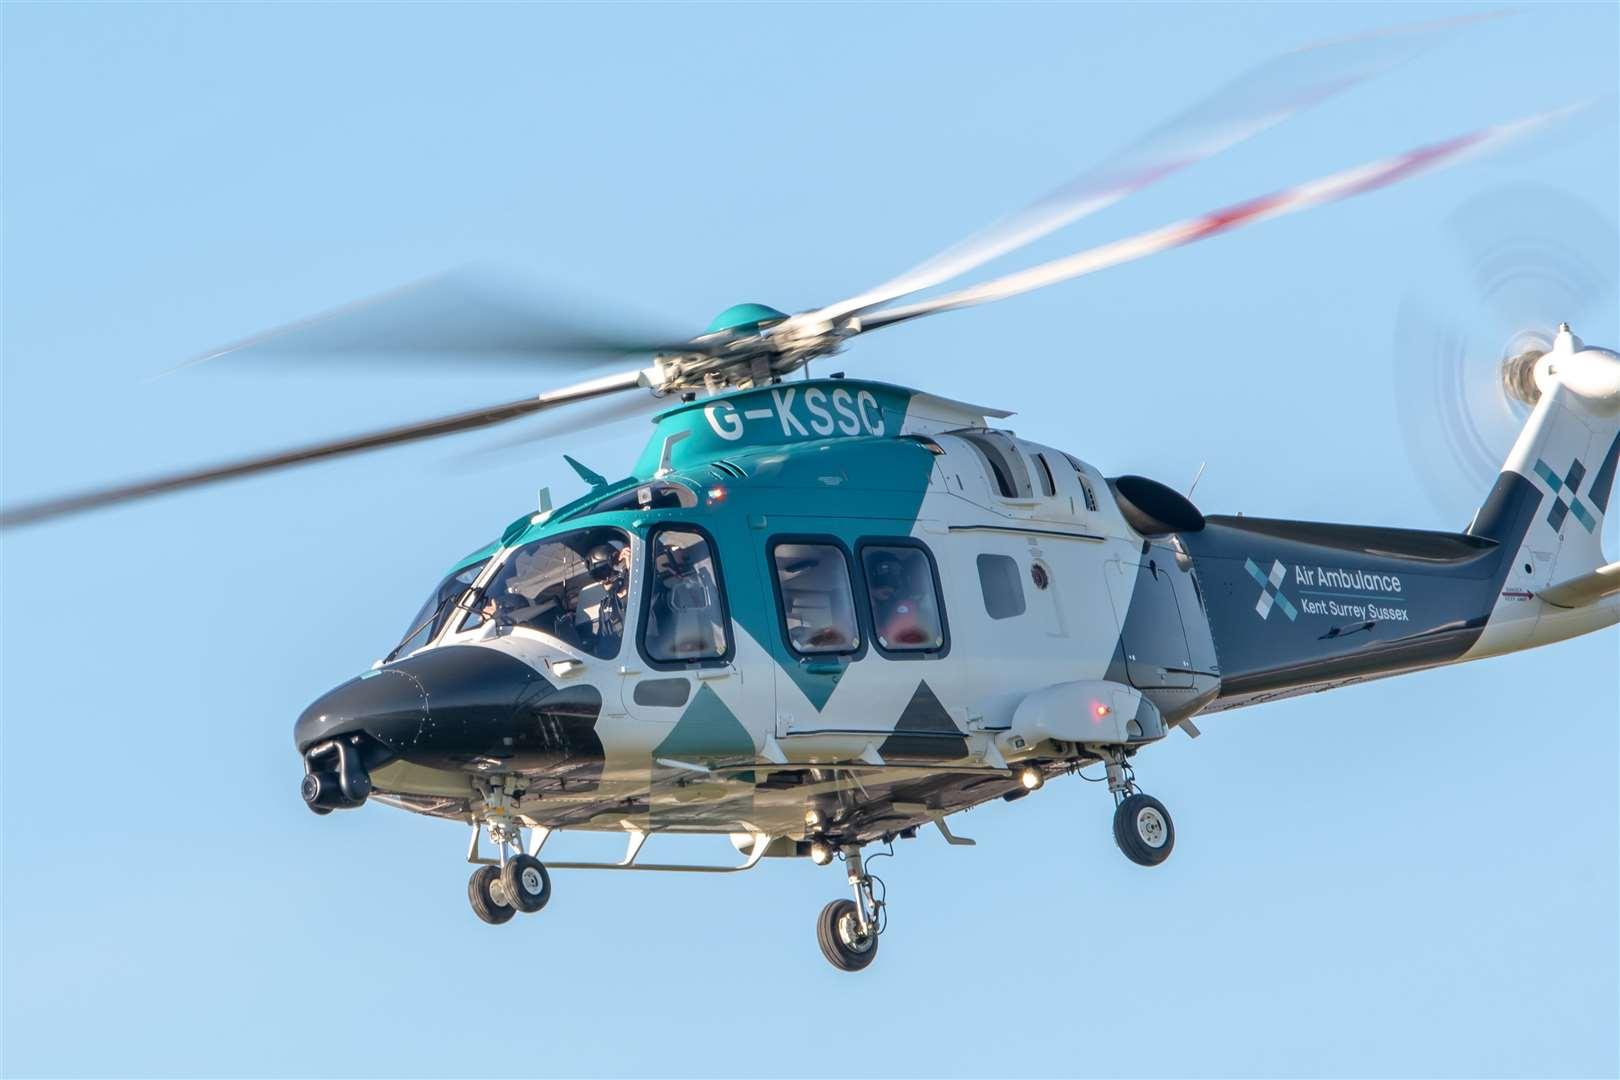 Air Ambulance Kent Surrey Sussex. Stock